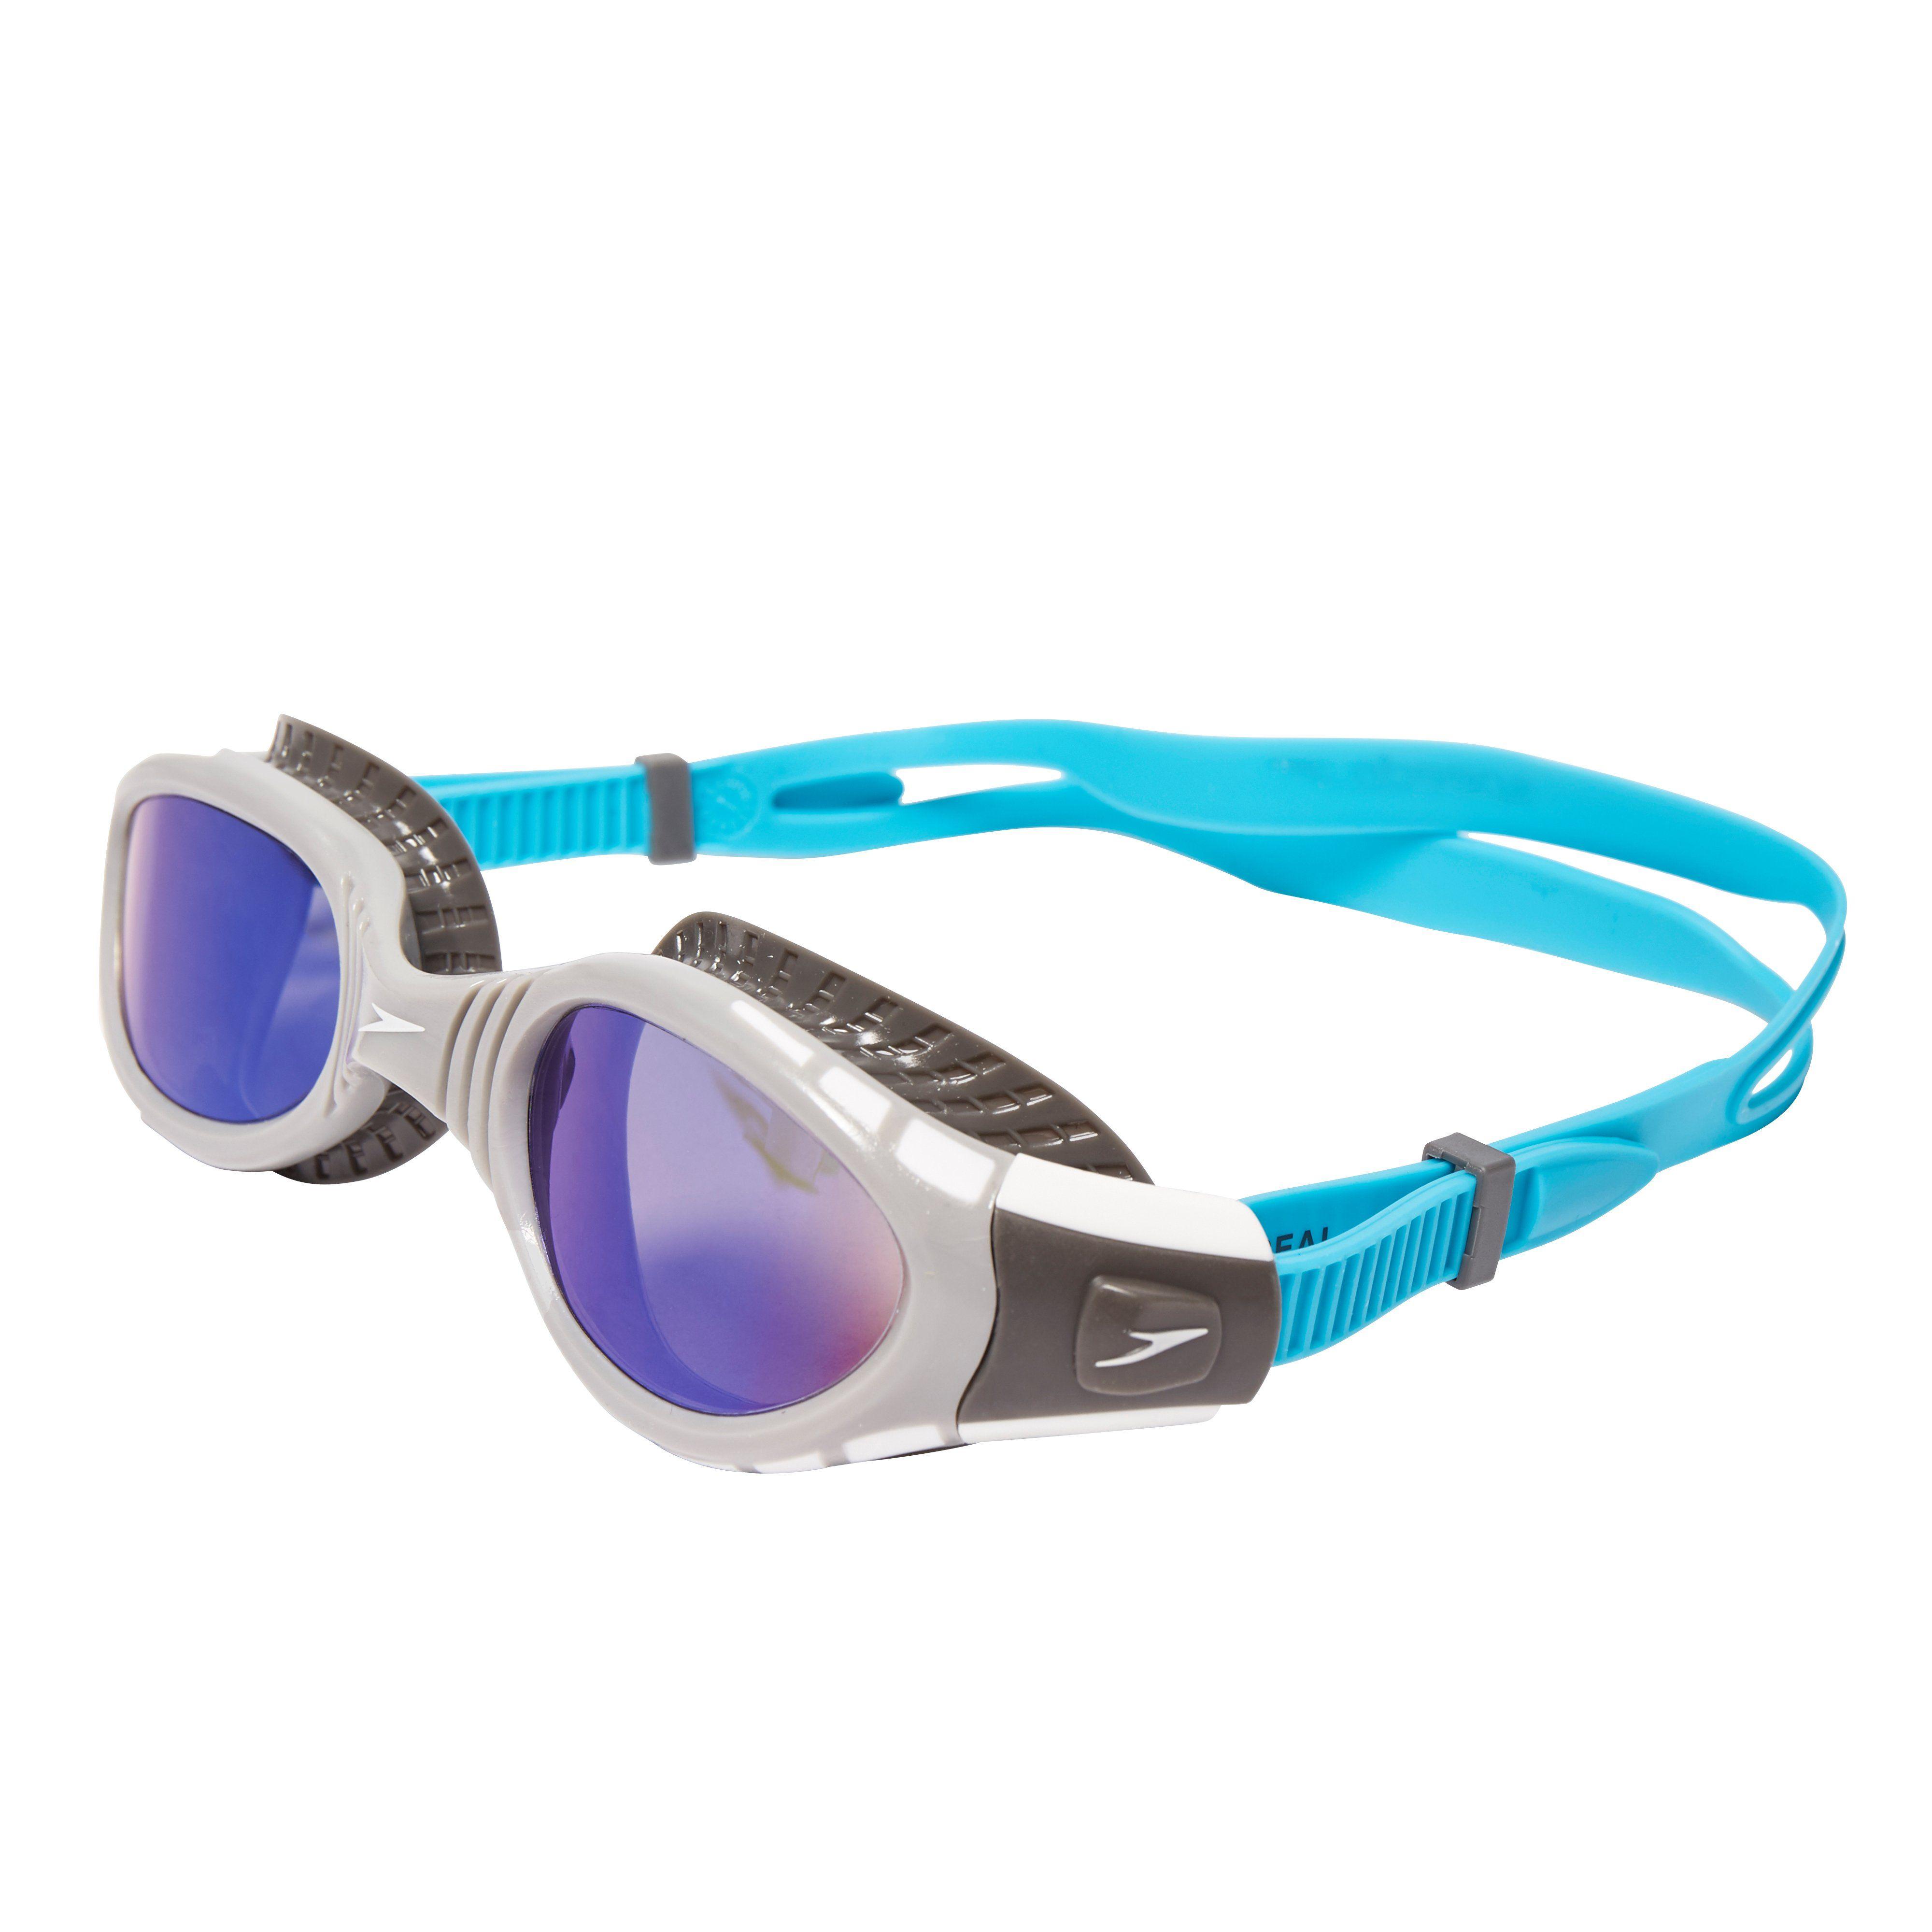 Speedo Futura Biofuse Flexiseal Mirror Adult Goggle